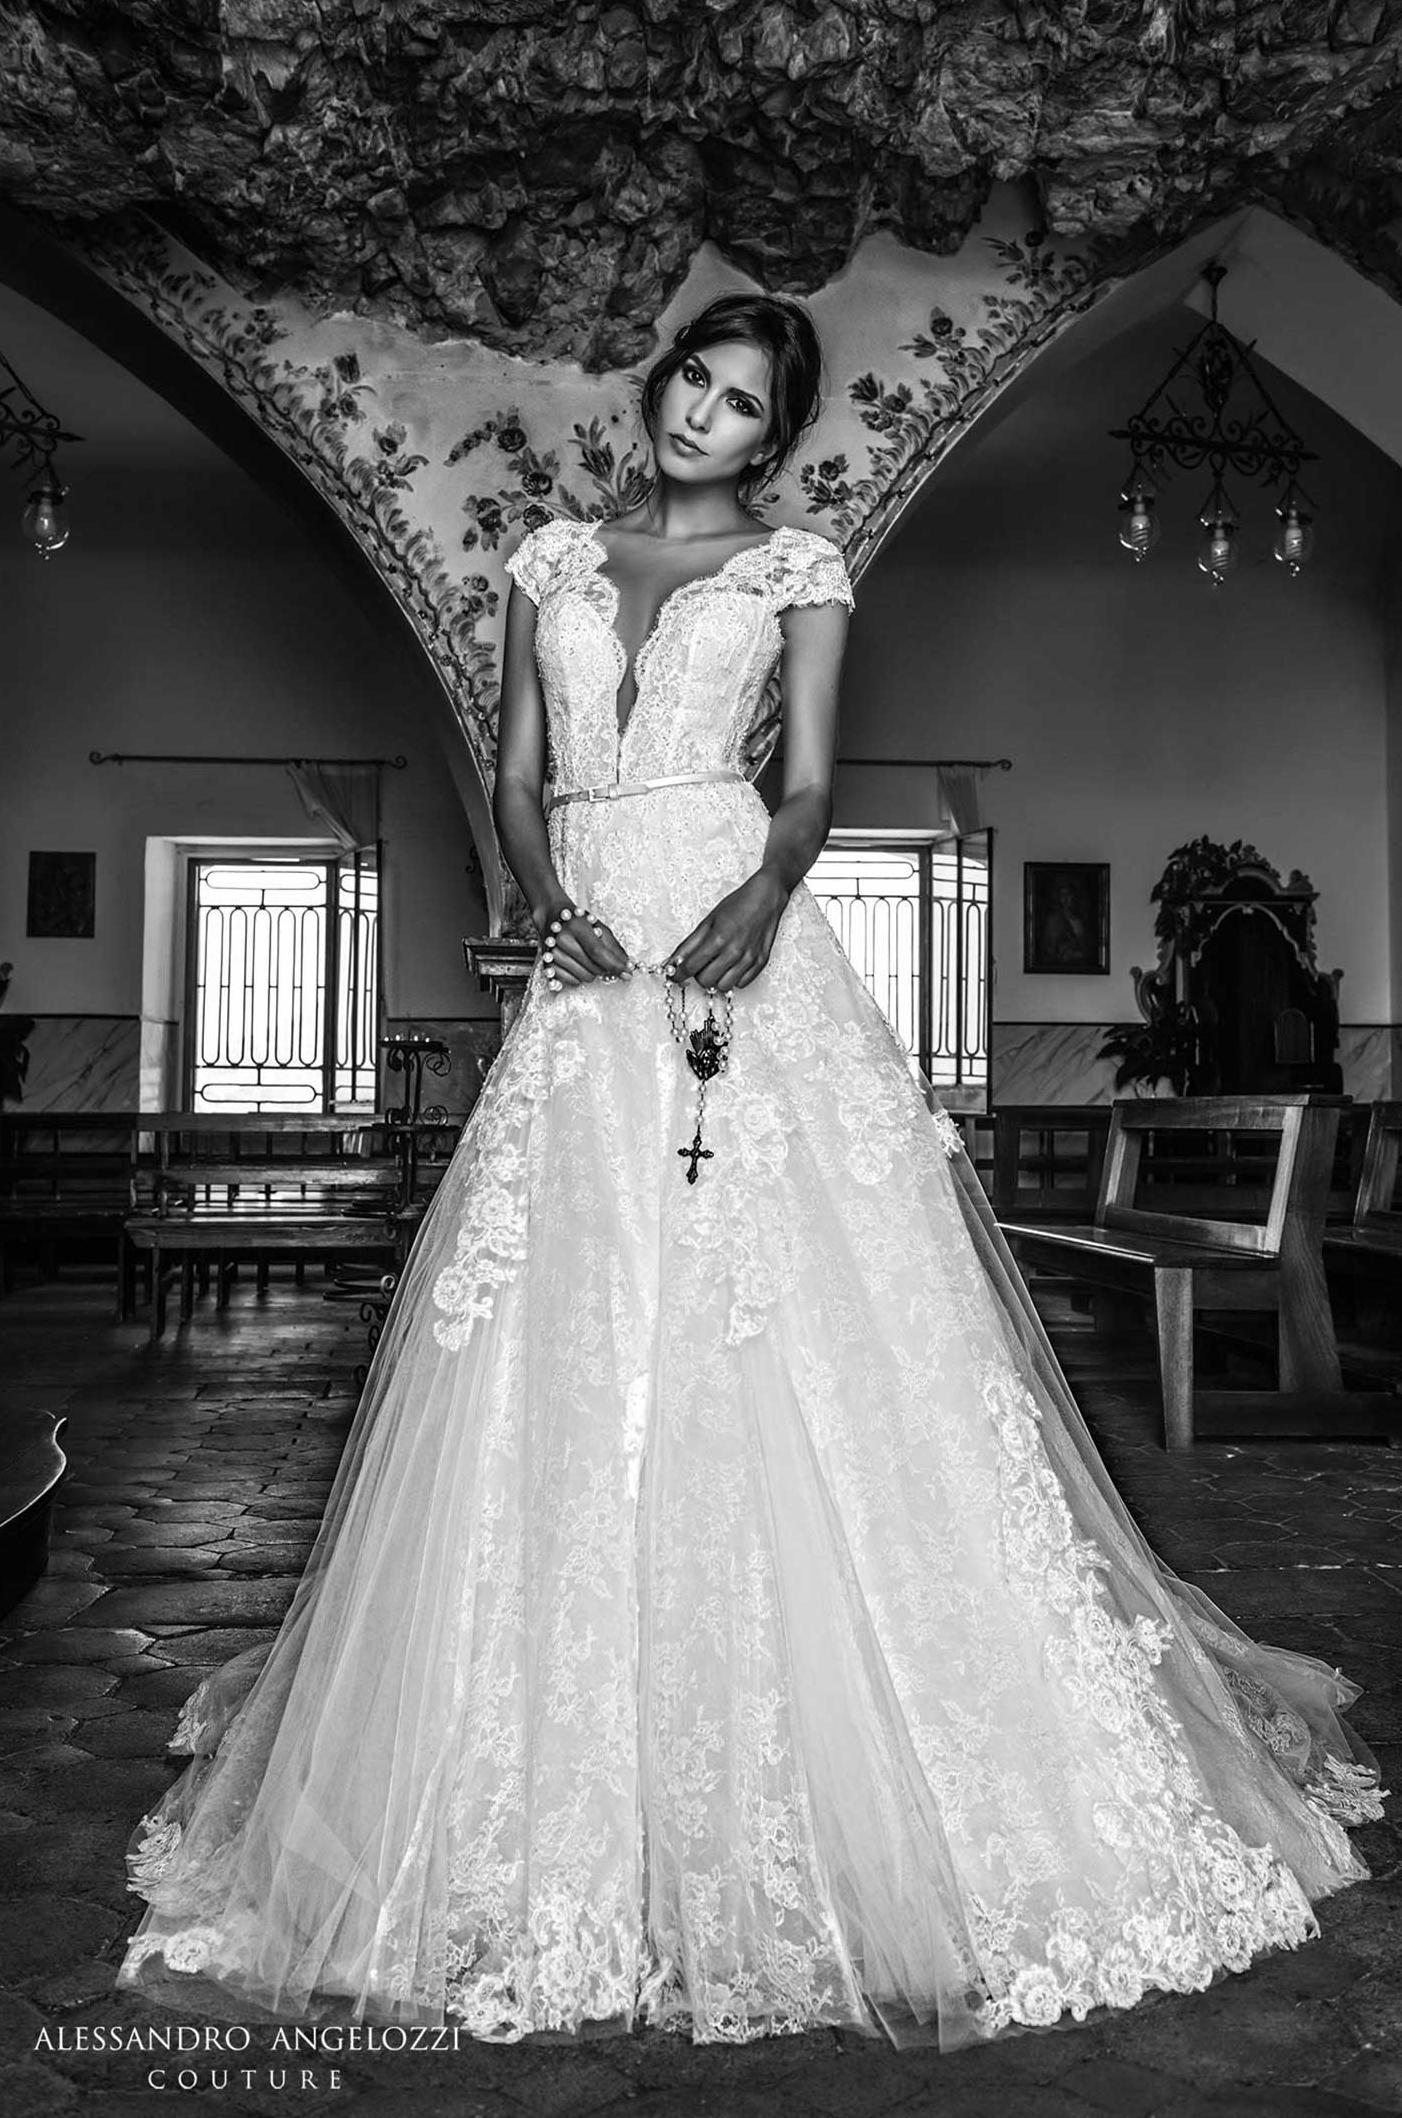 Matrimonio Country Chic In Puglia : Alessandro angelozzi couture rm matrimoniosud